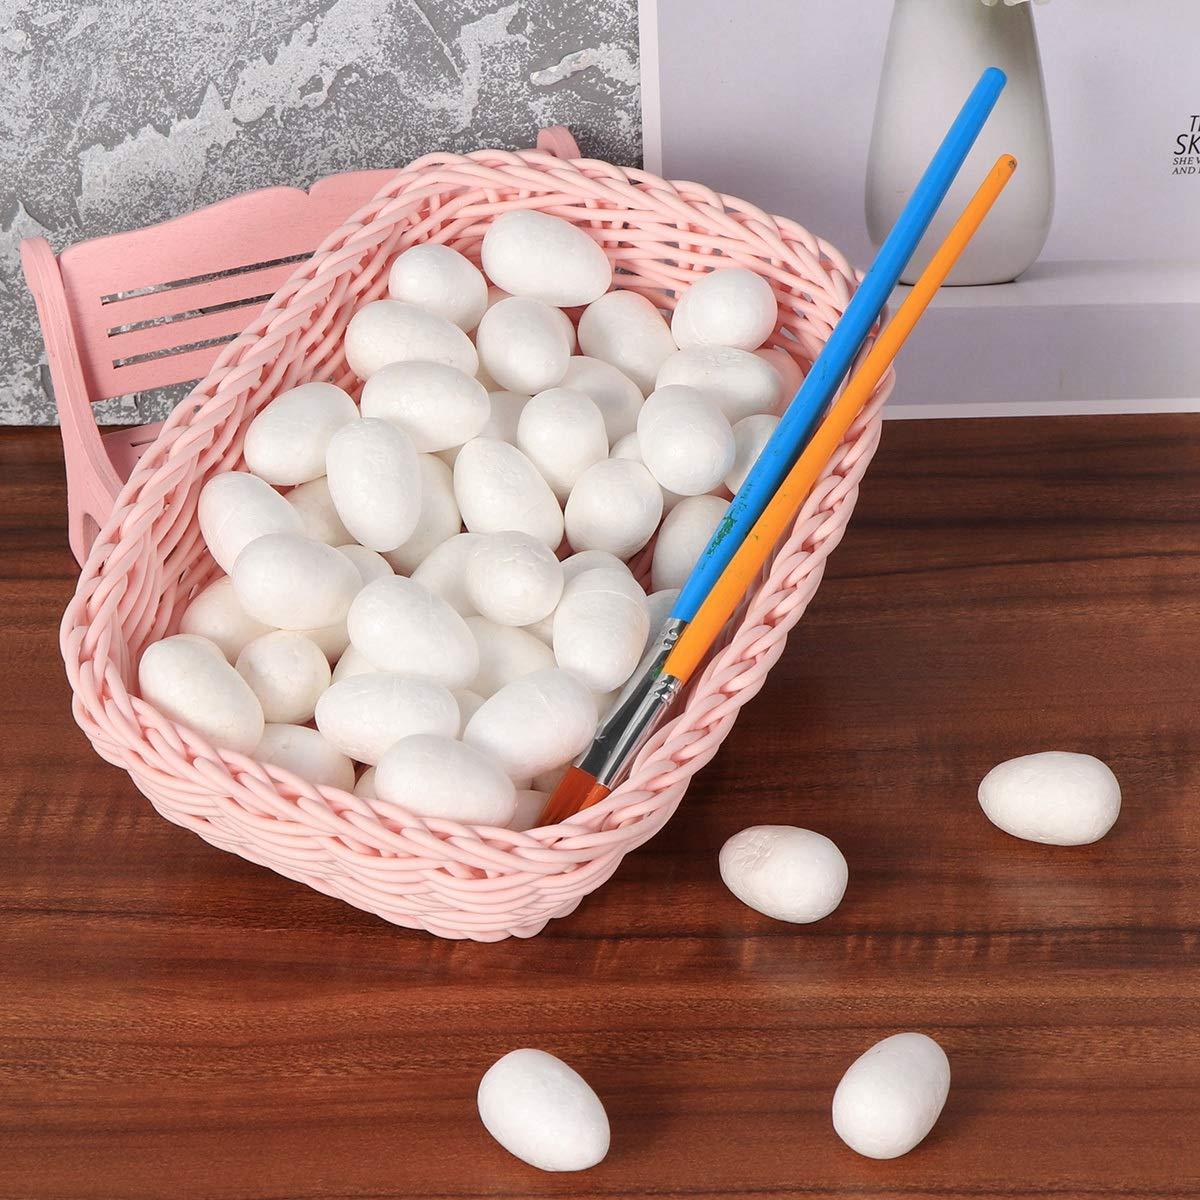 bianco, 3-4 cm Amosfun 100pcs uova di schiuma bianca pittura Easter Egg Craftfor per bambini piccoli